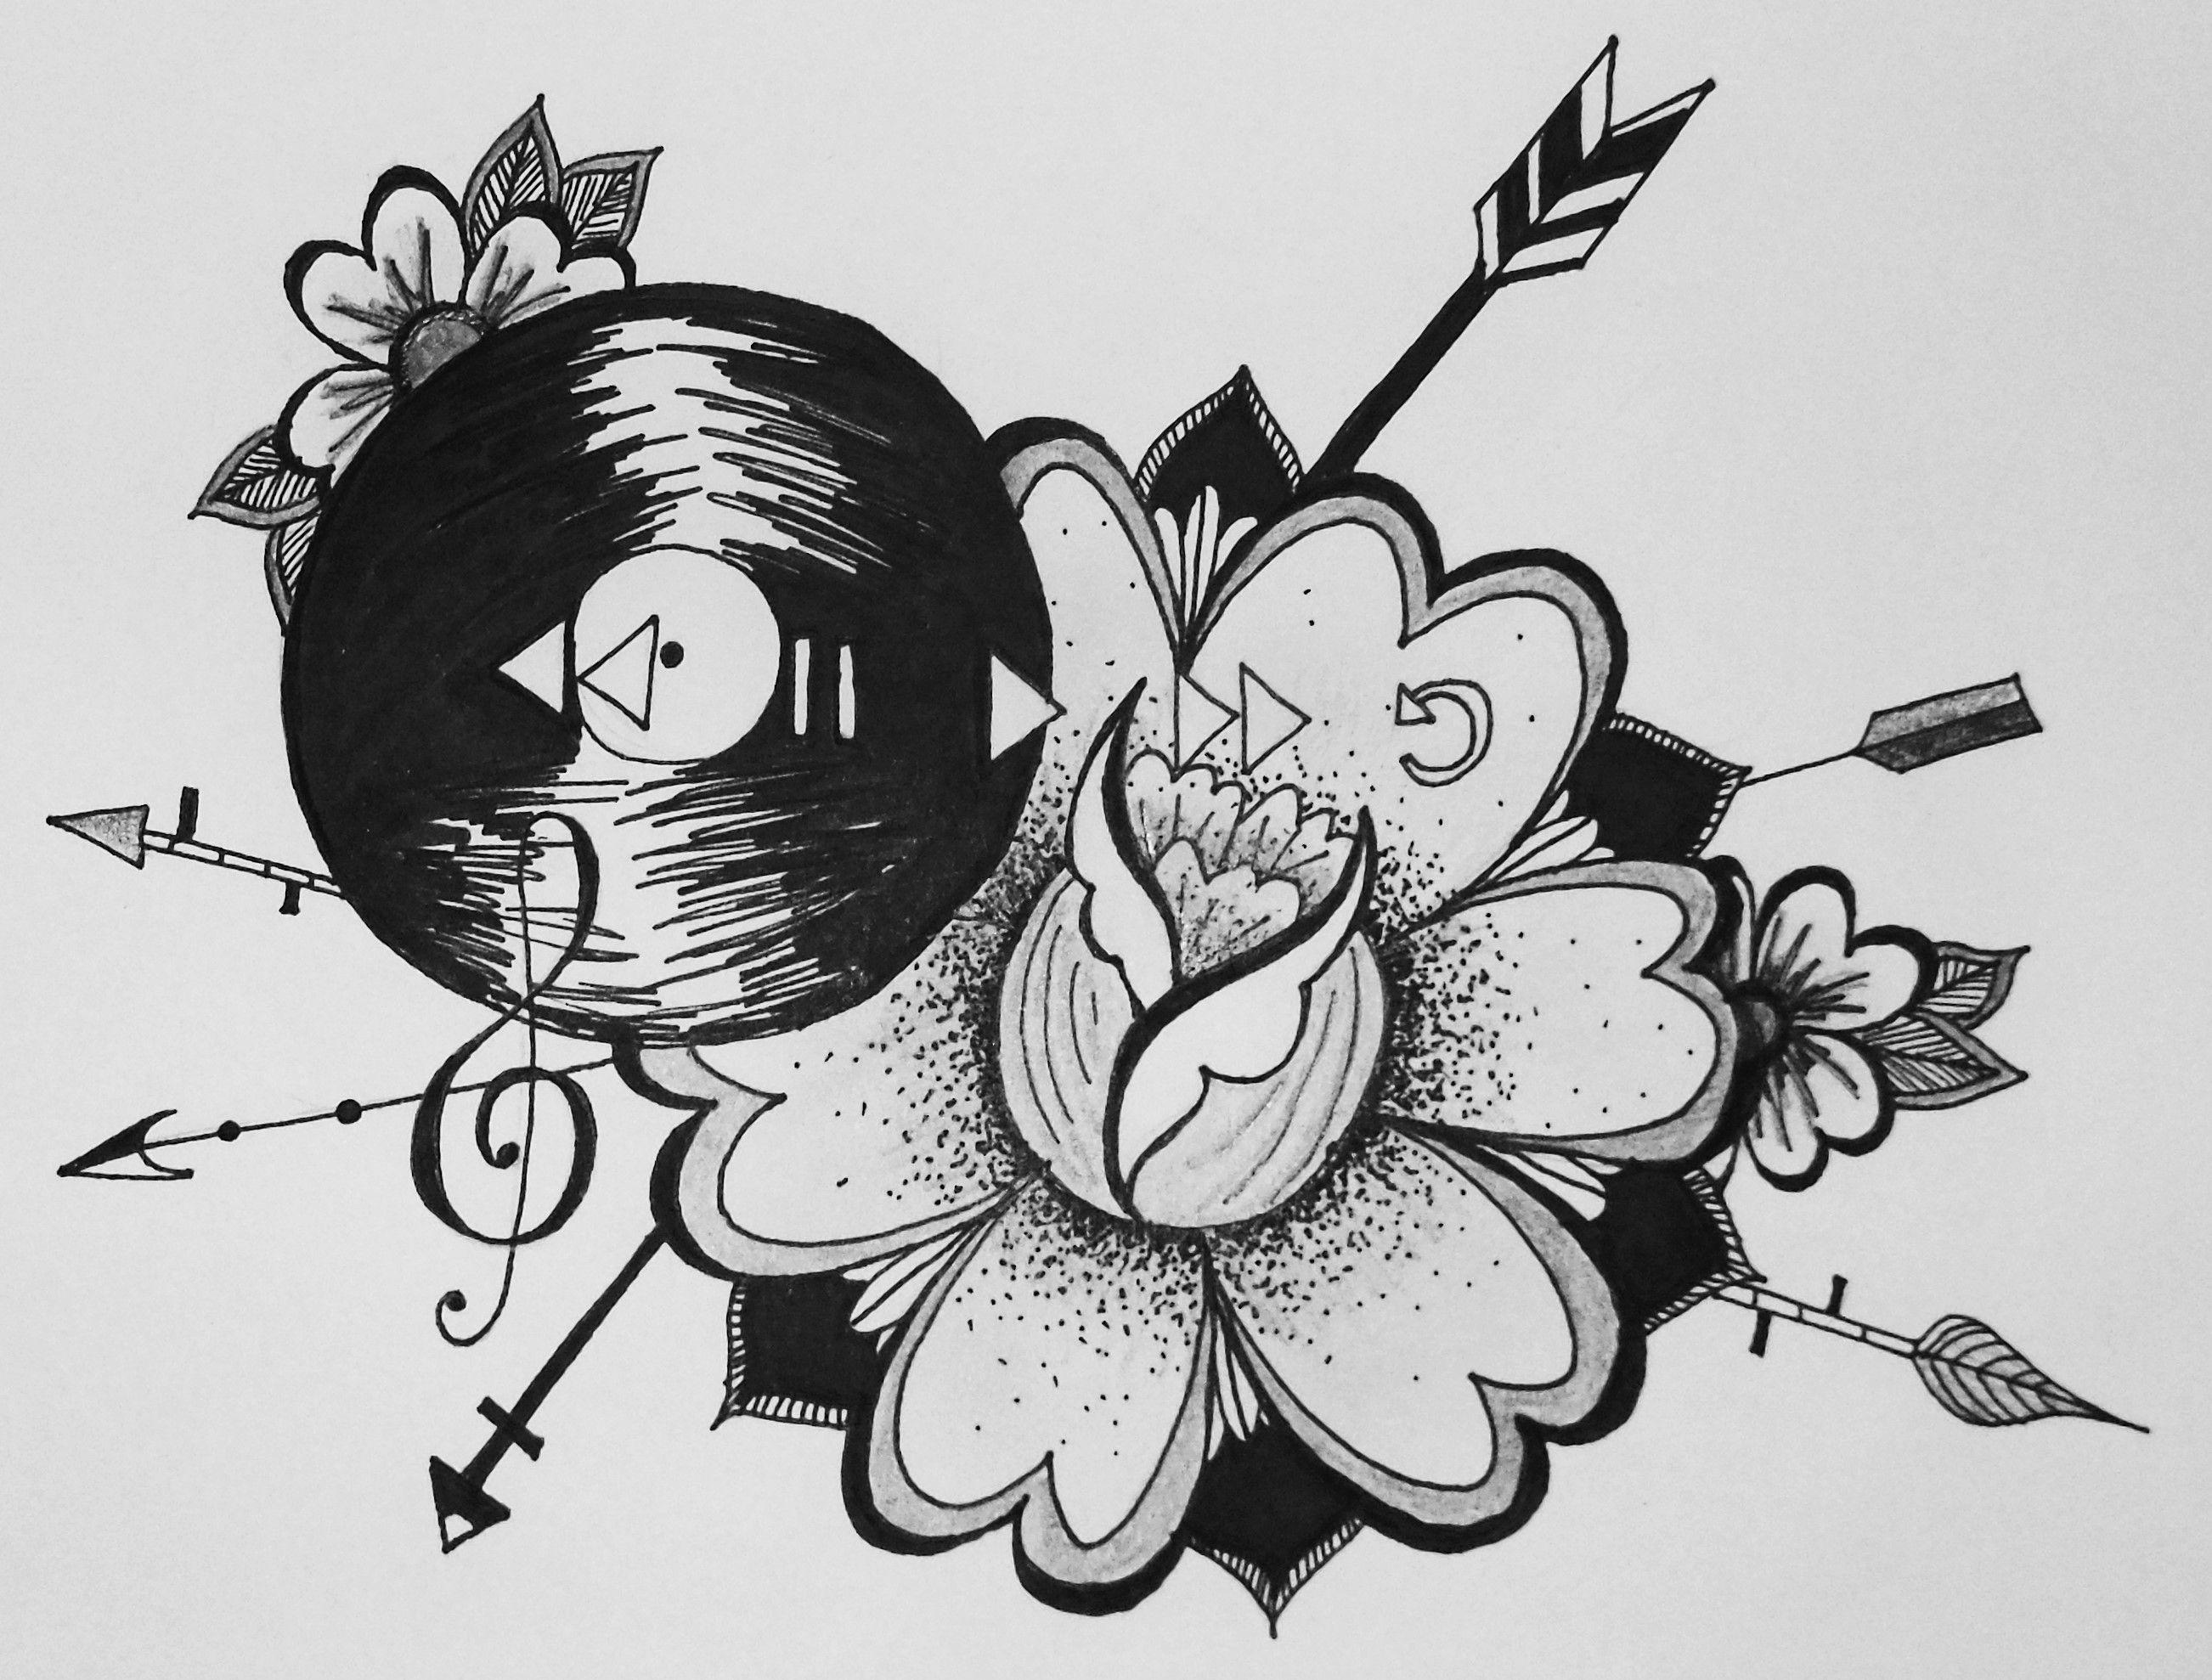 Line Art Tattoo Designs : Music note record pop punk inspired floral arrow tattoo design